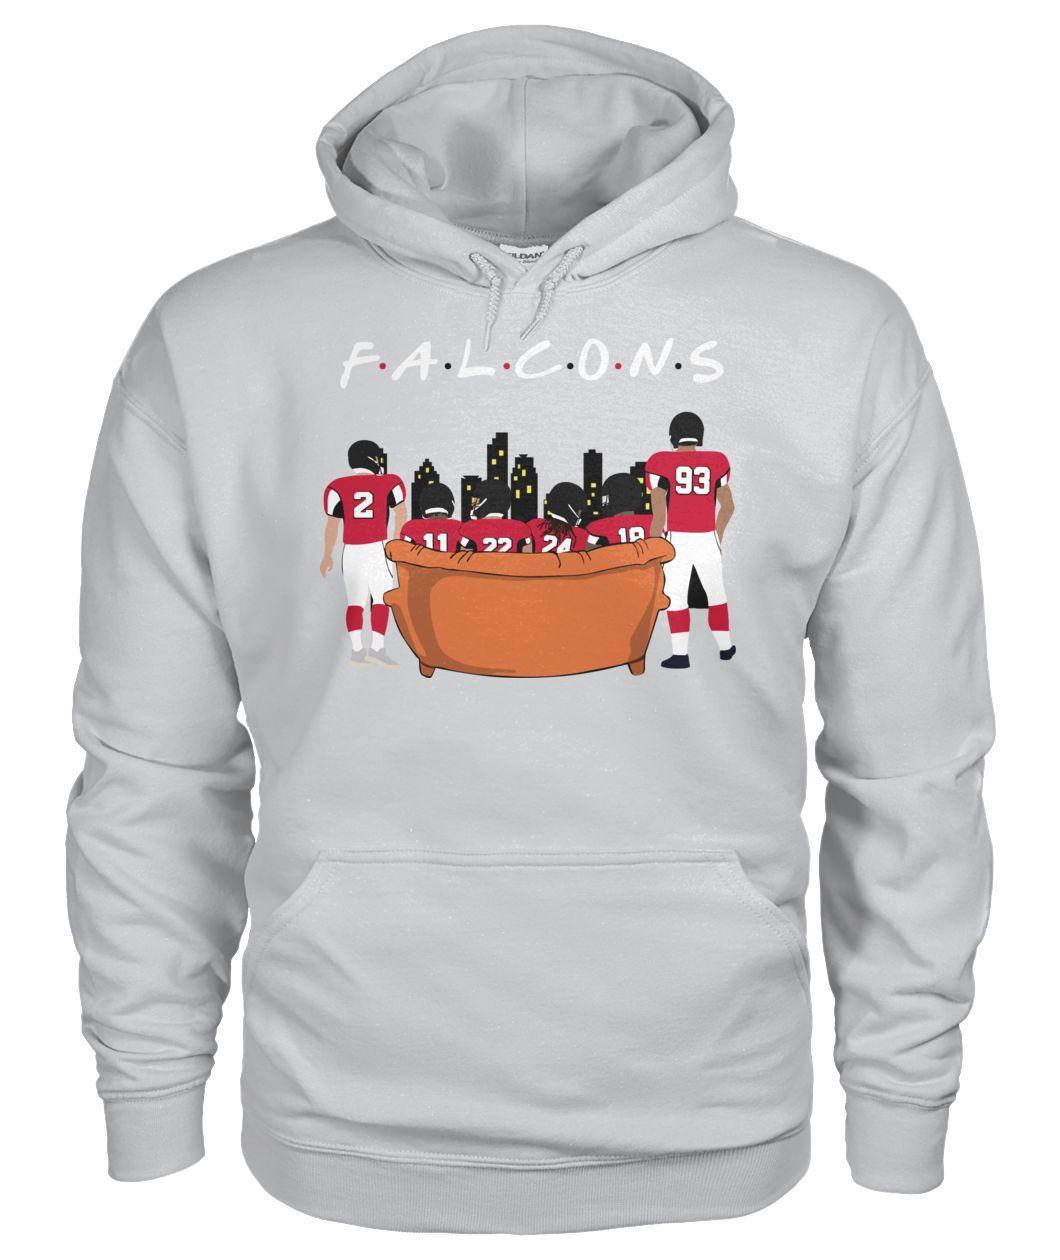 Official Atlanta Falcons Friends TV Show Hoodie